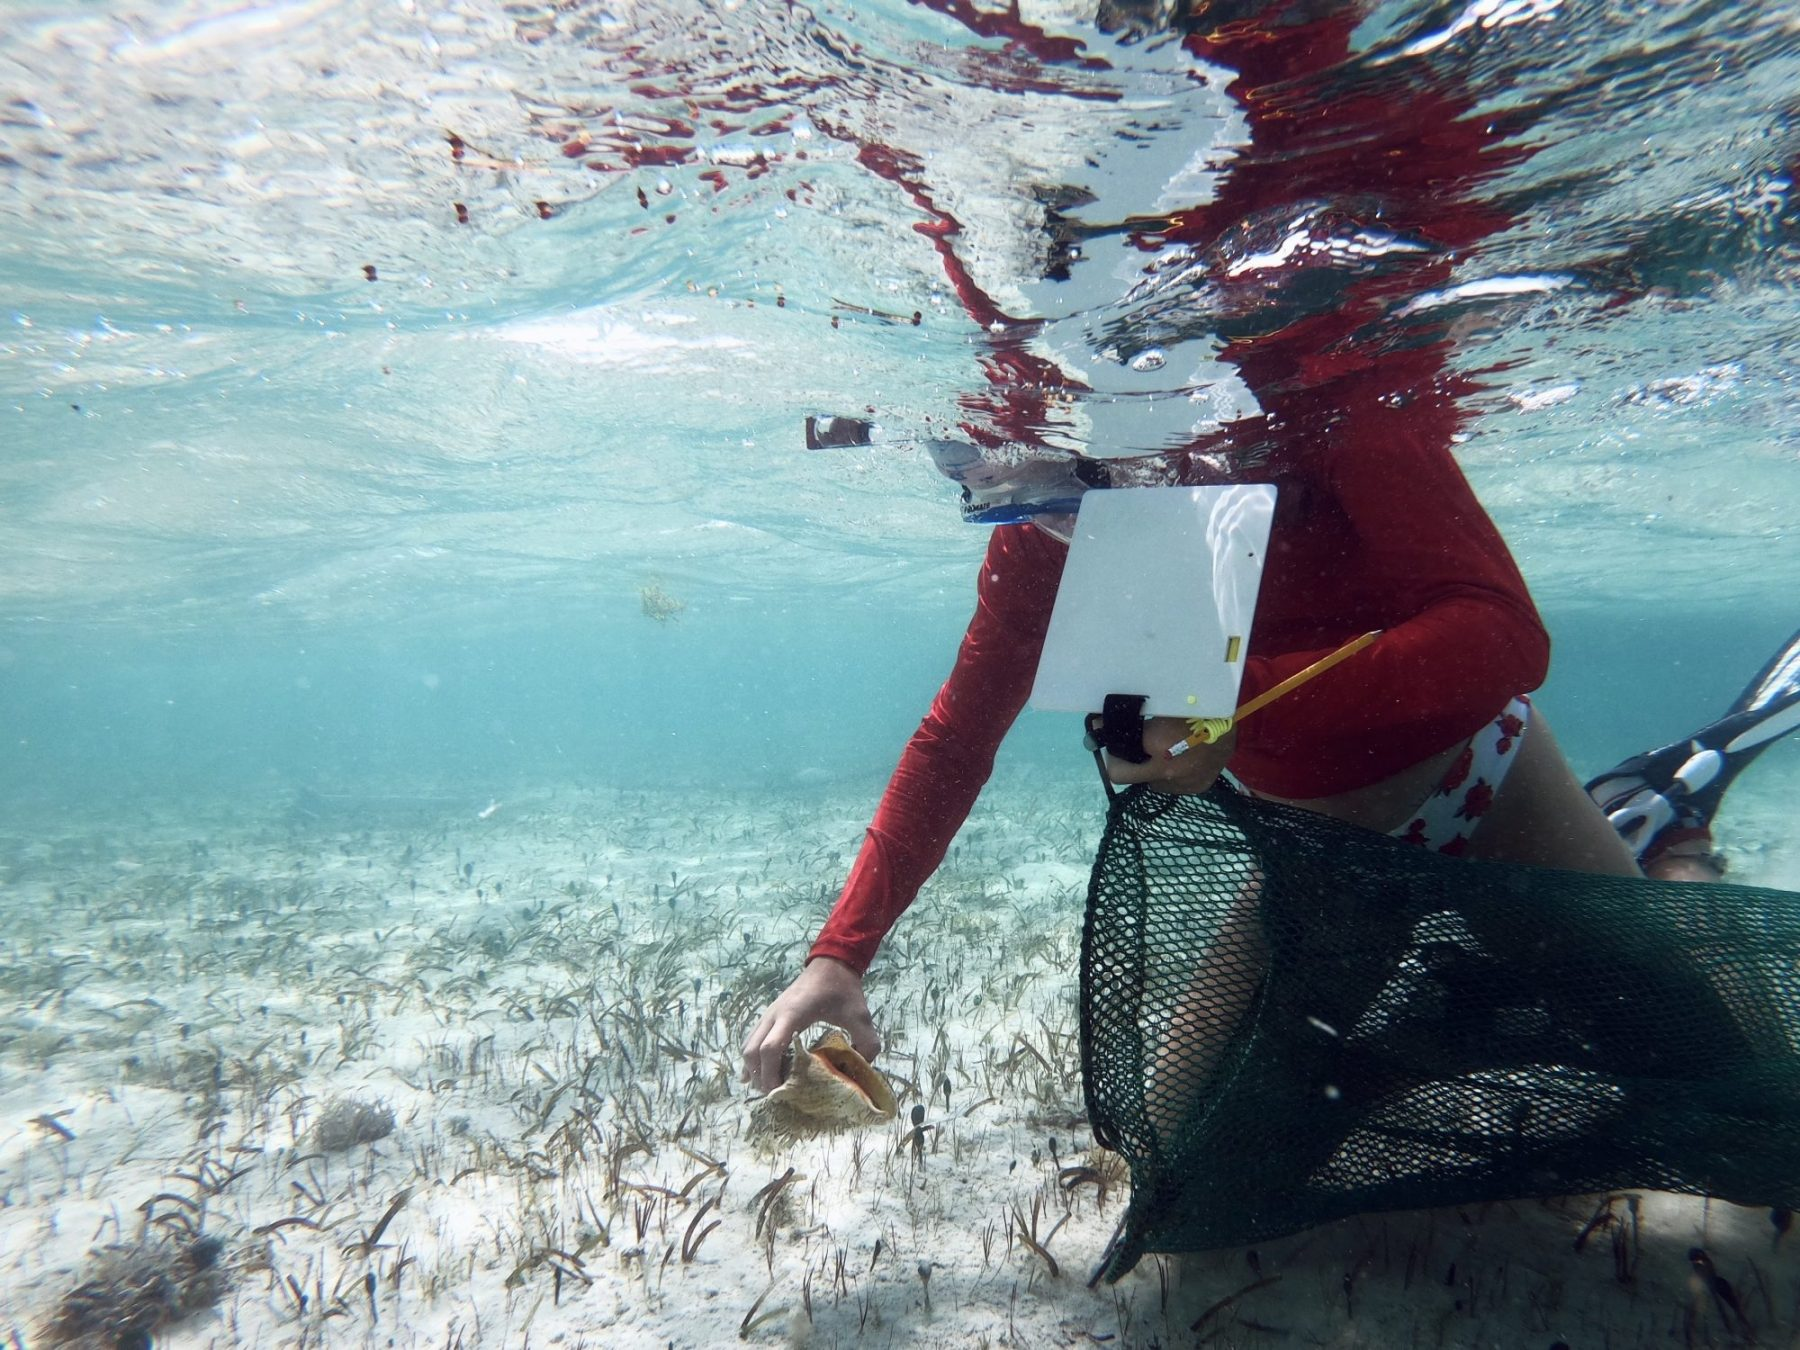 Delaney Lawson collecting conch shells underwater